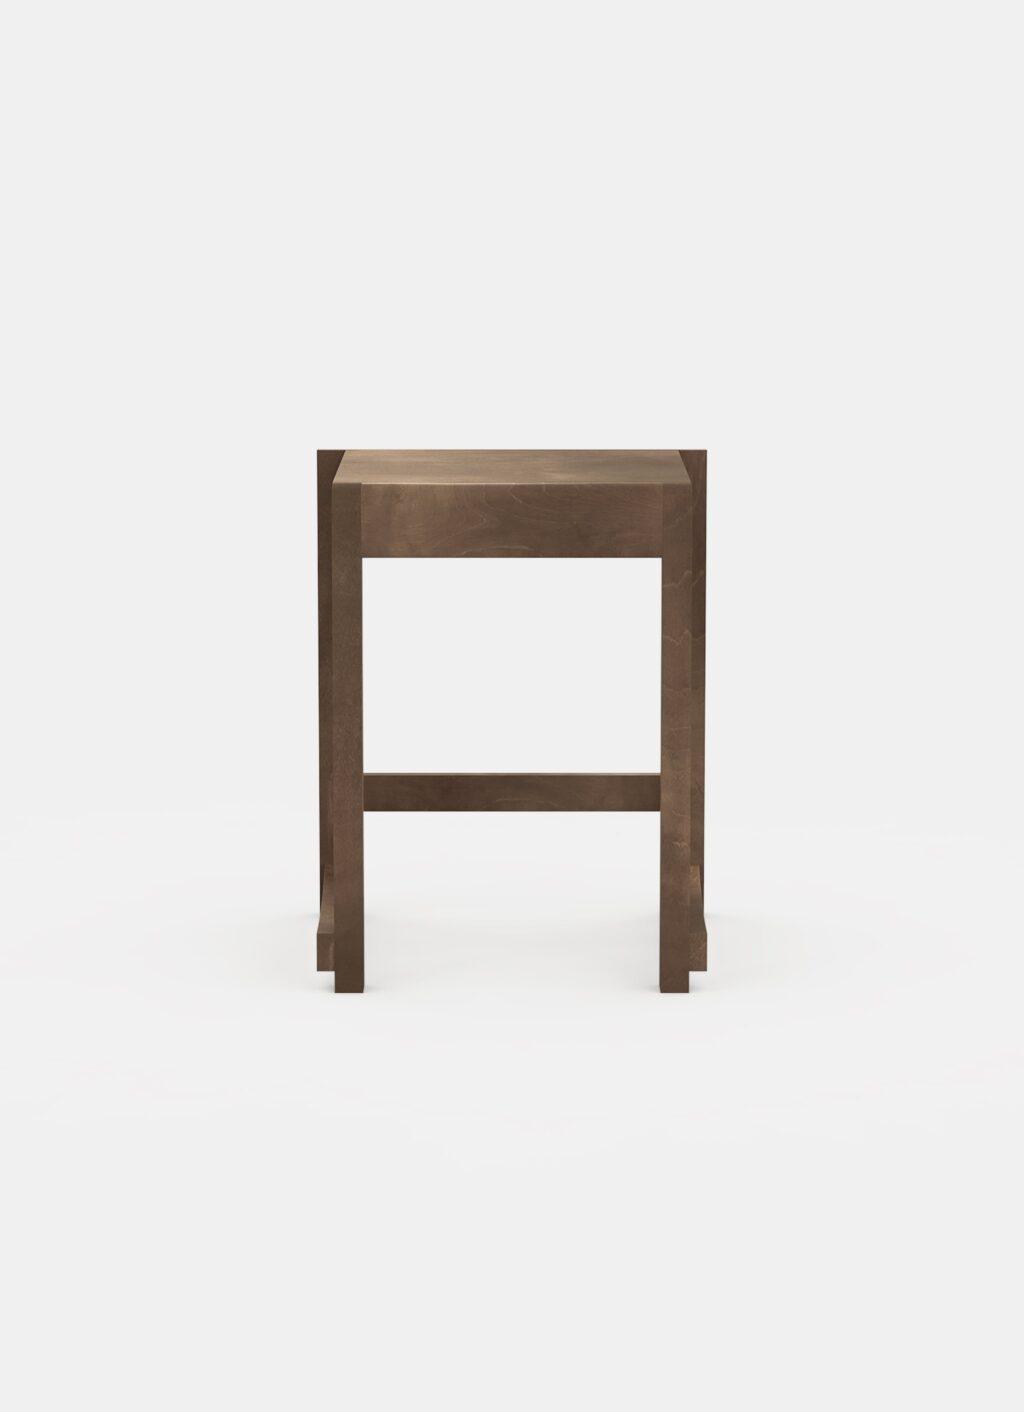 Frama - Low Stool 01 - Dark Wood